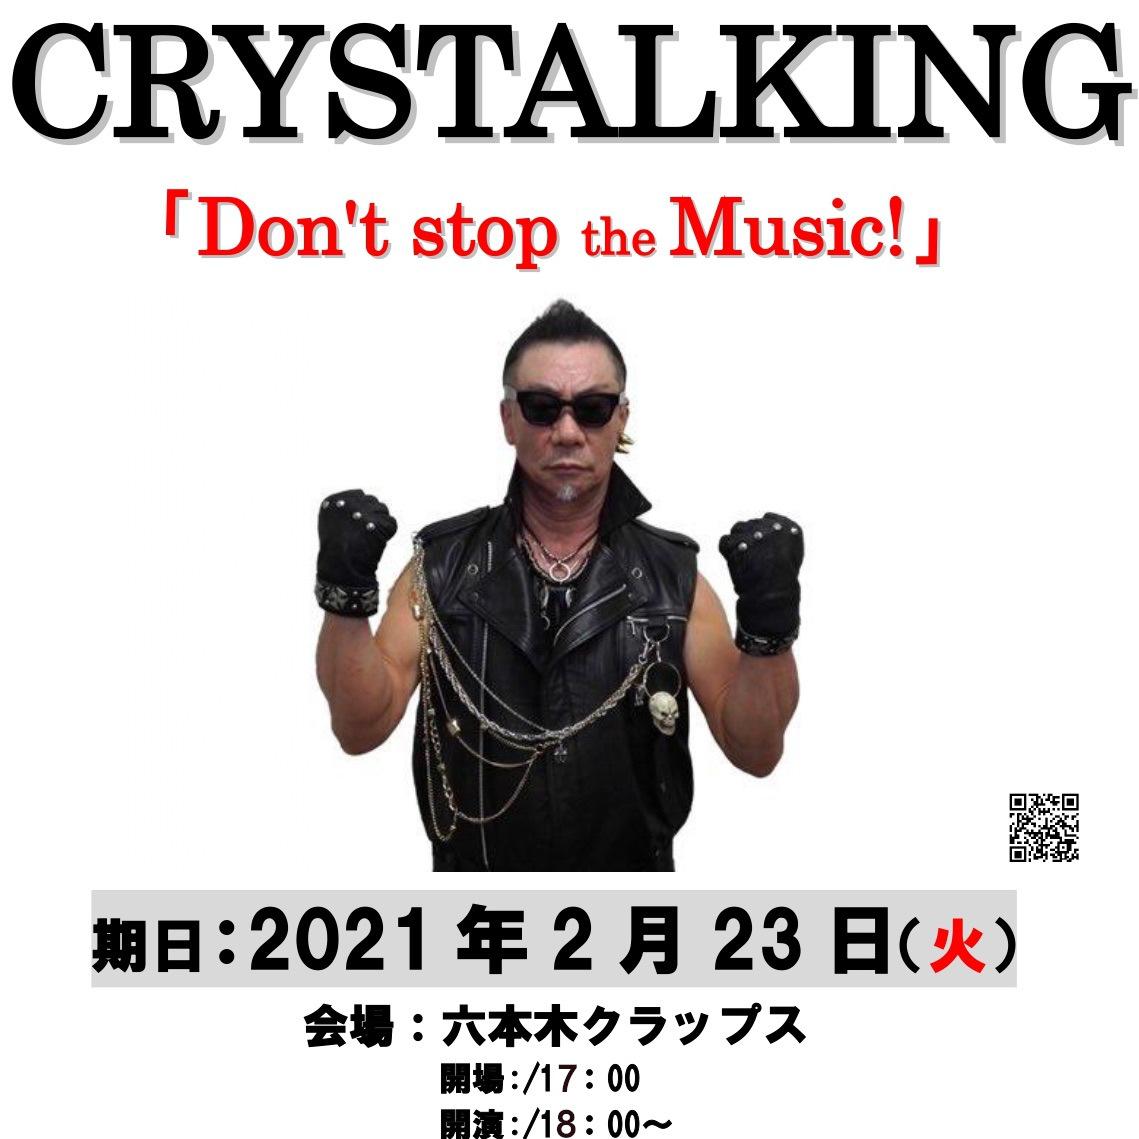 CRYSTALKING